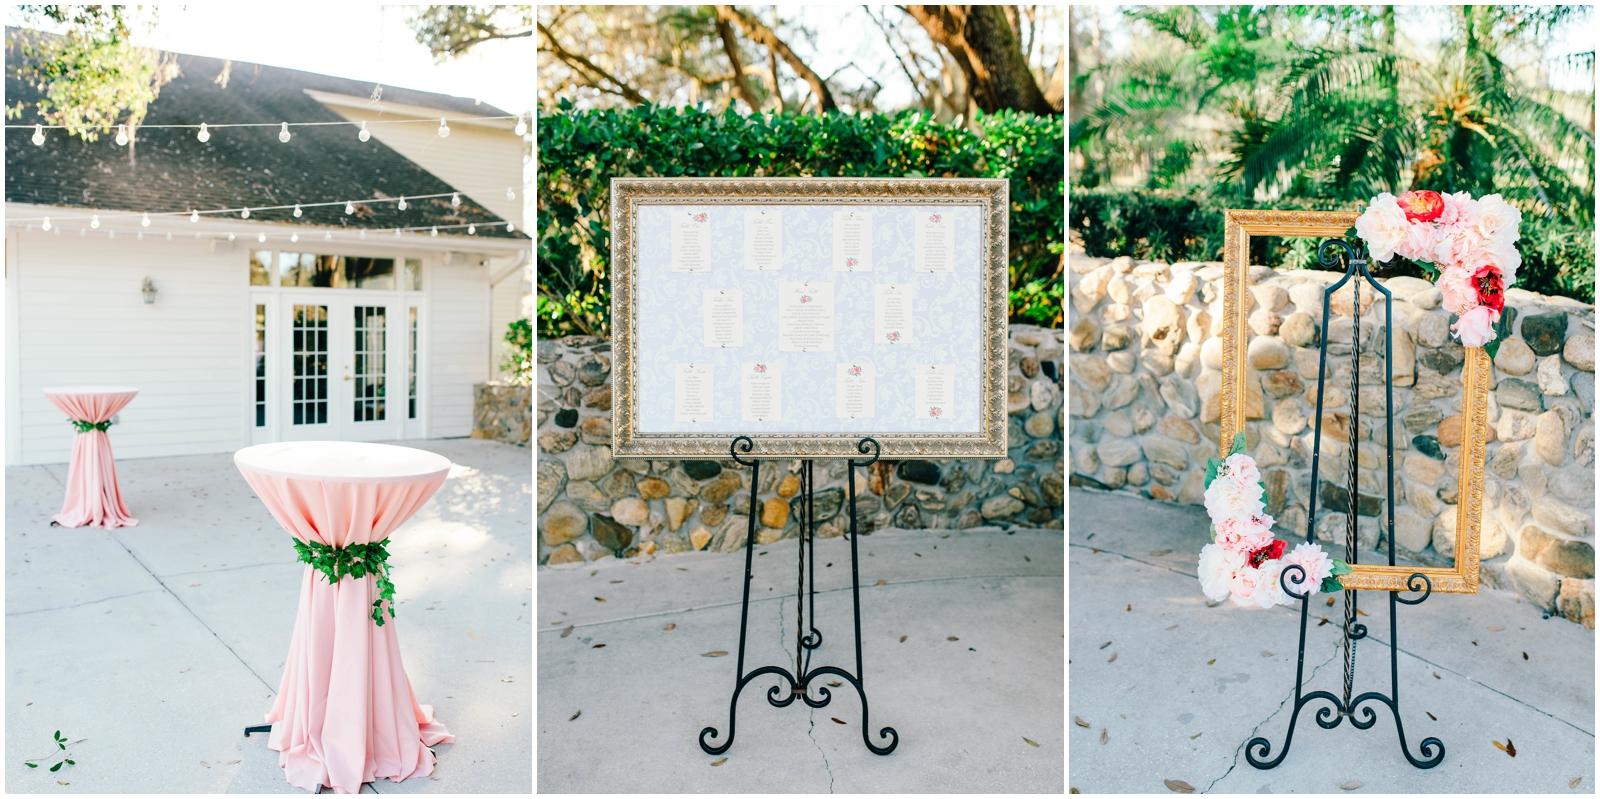 Tampa Area Wedding Venue with Southern Charm- Stonebridge Events_0274.jpg